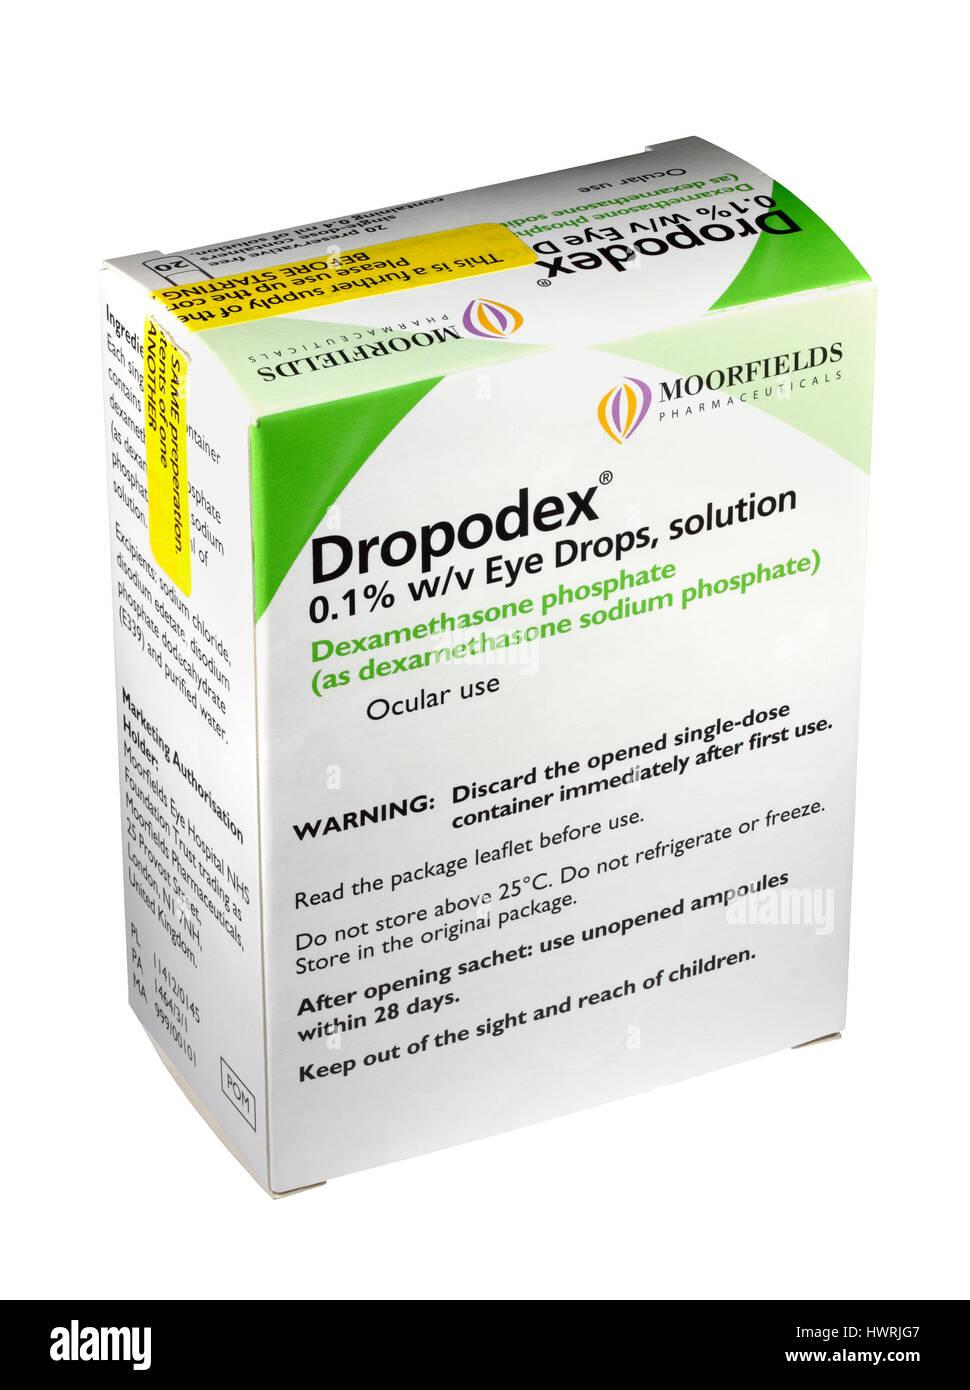 A box of 20 Dropodex 0.1% Dexamethasone sodium phosphate single dose eye drop solution 0.4 ml ampoules / ampules - Stock Image